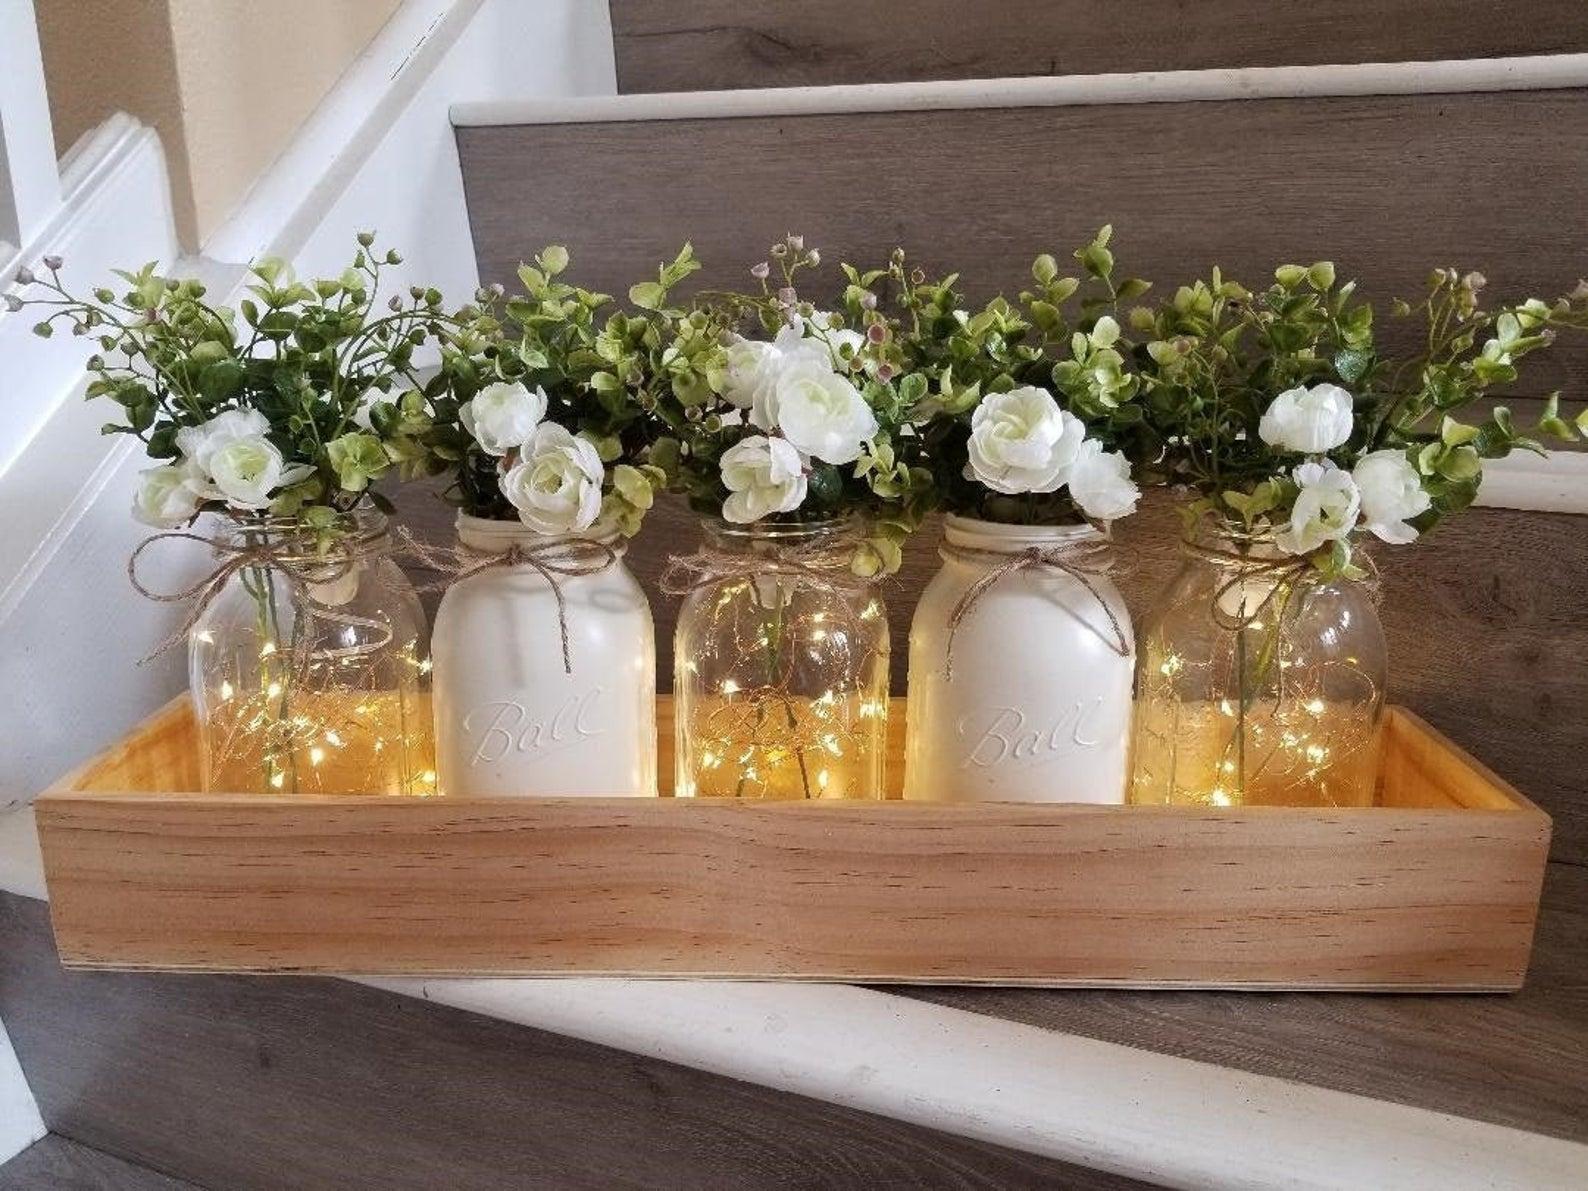 Rustic wedding centerpiece in wooden box